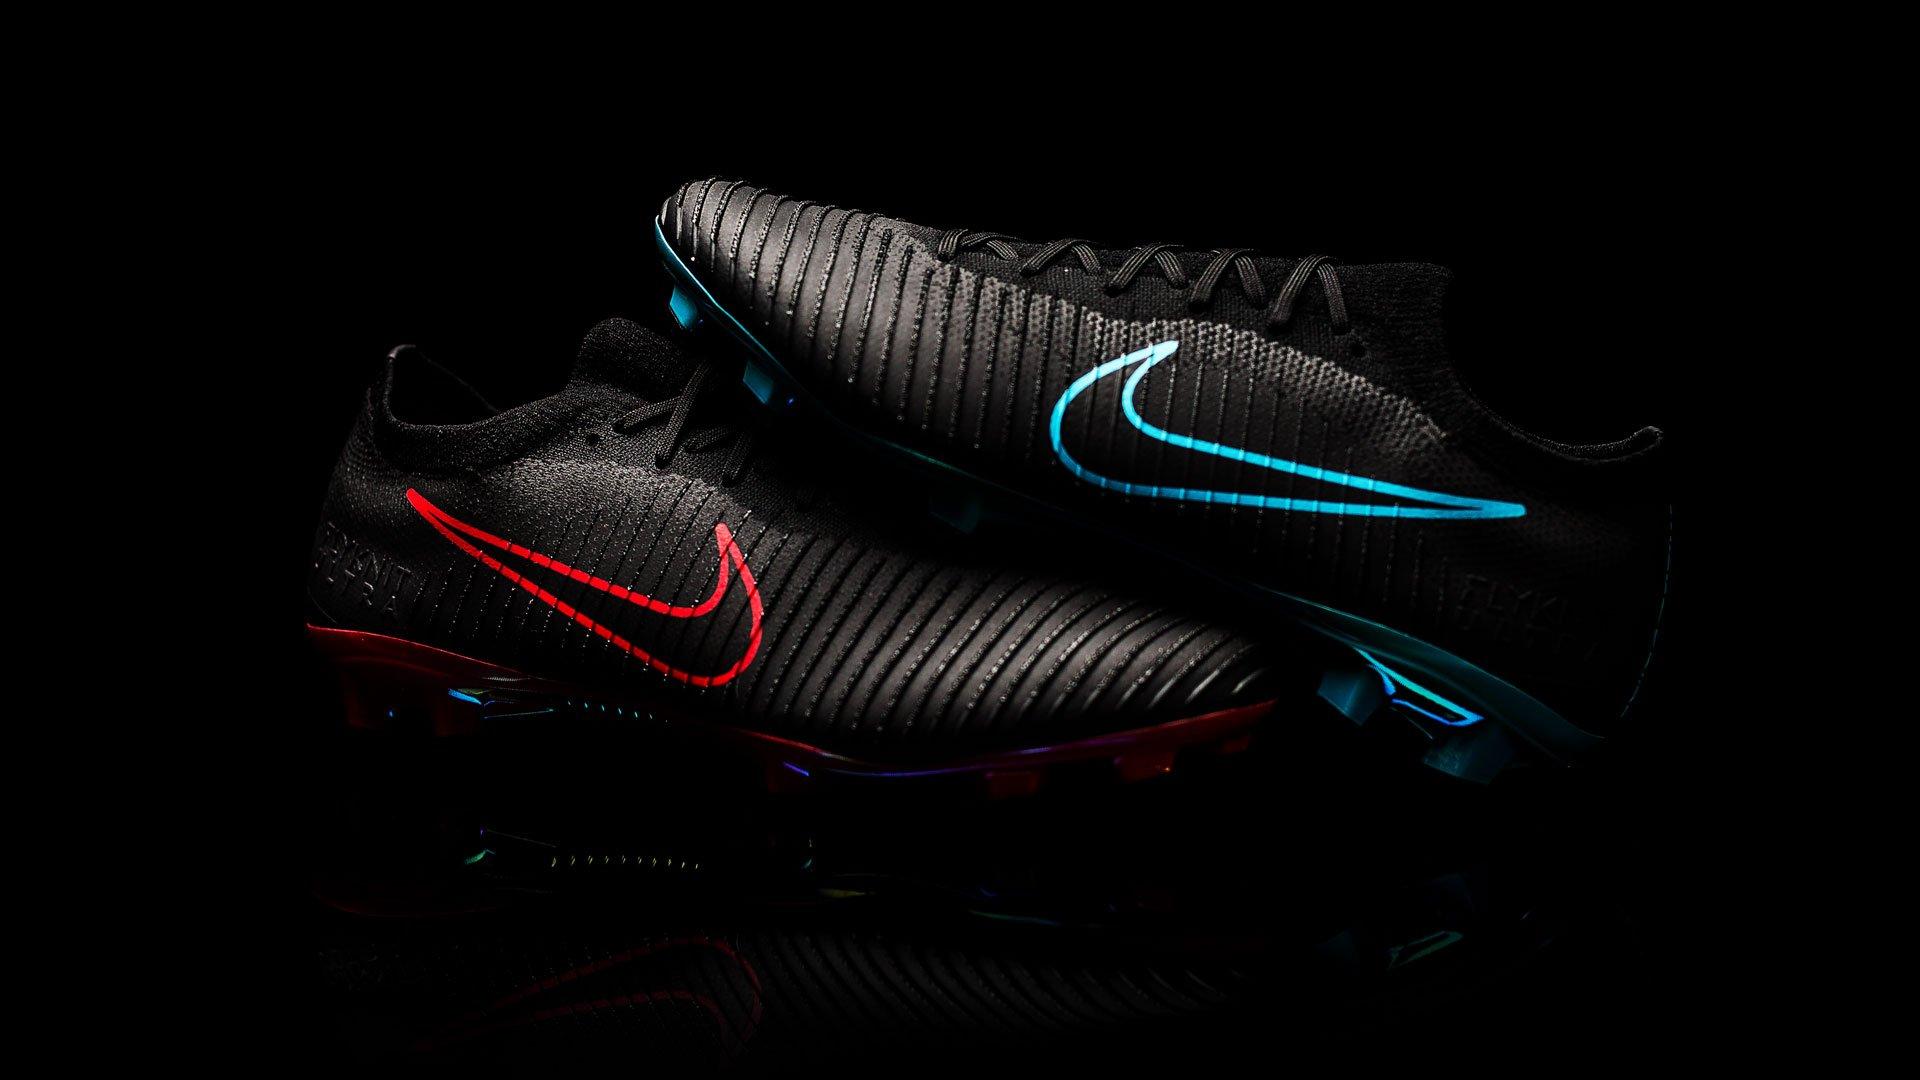 Erlebe den Nike Mercurial Vapor Flyknit Ultra 'Play Fire